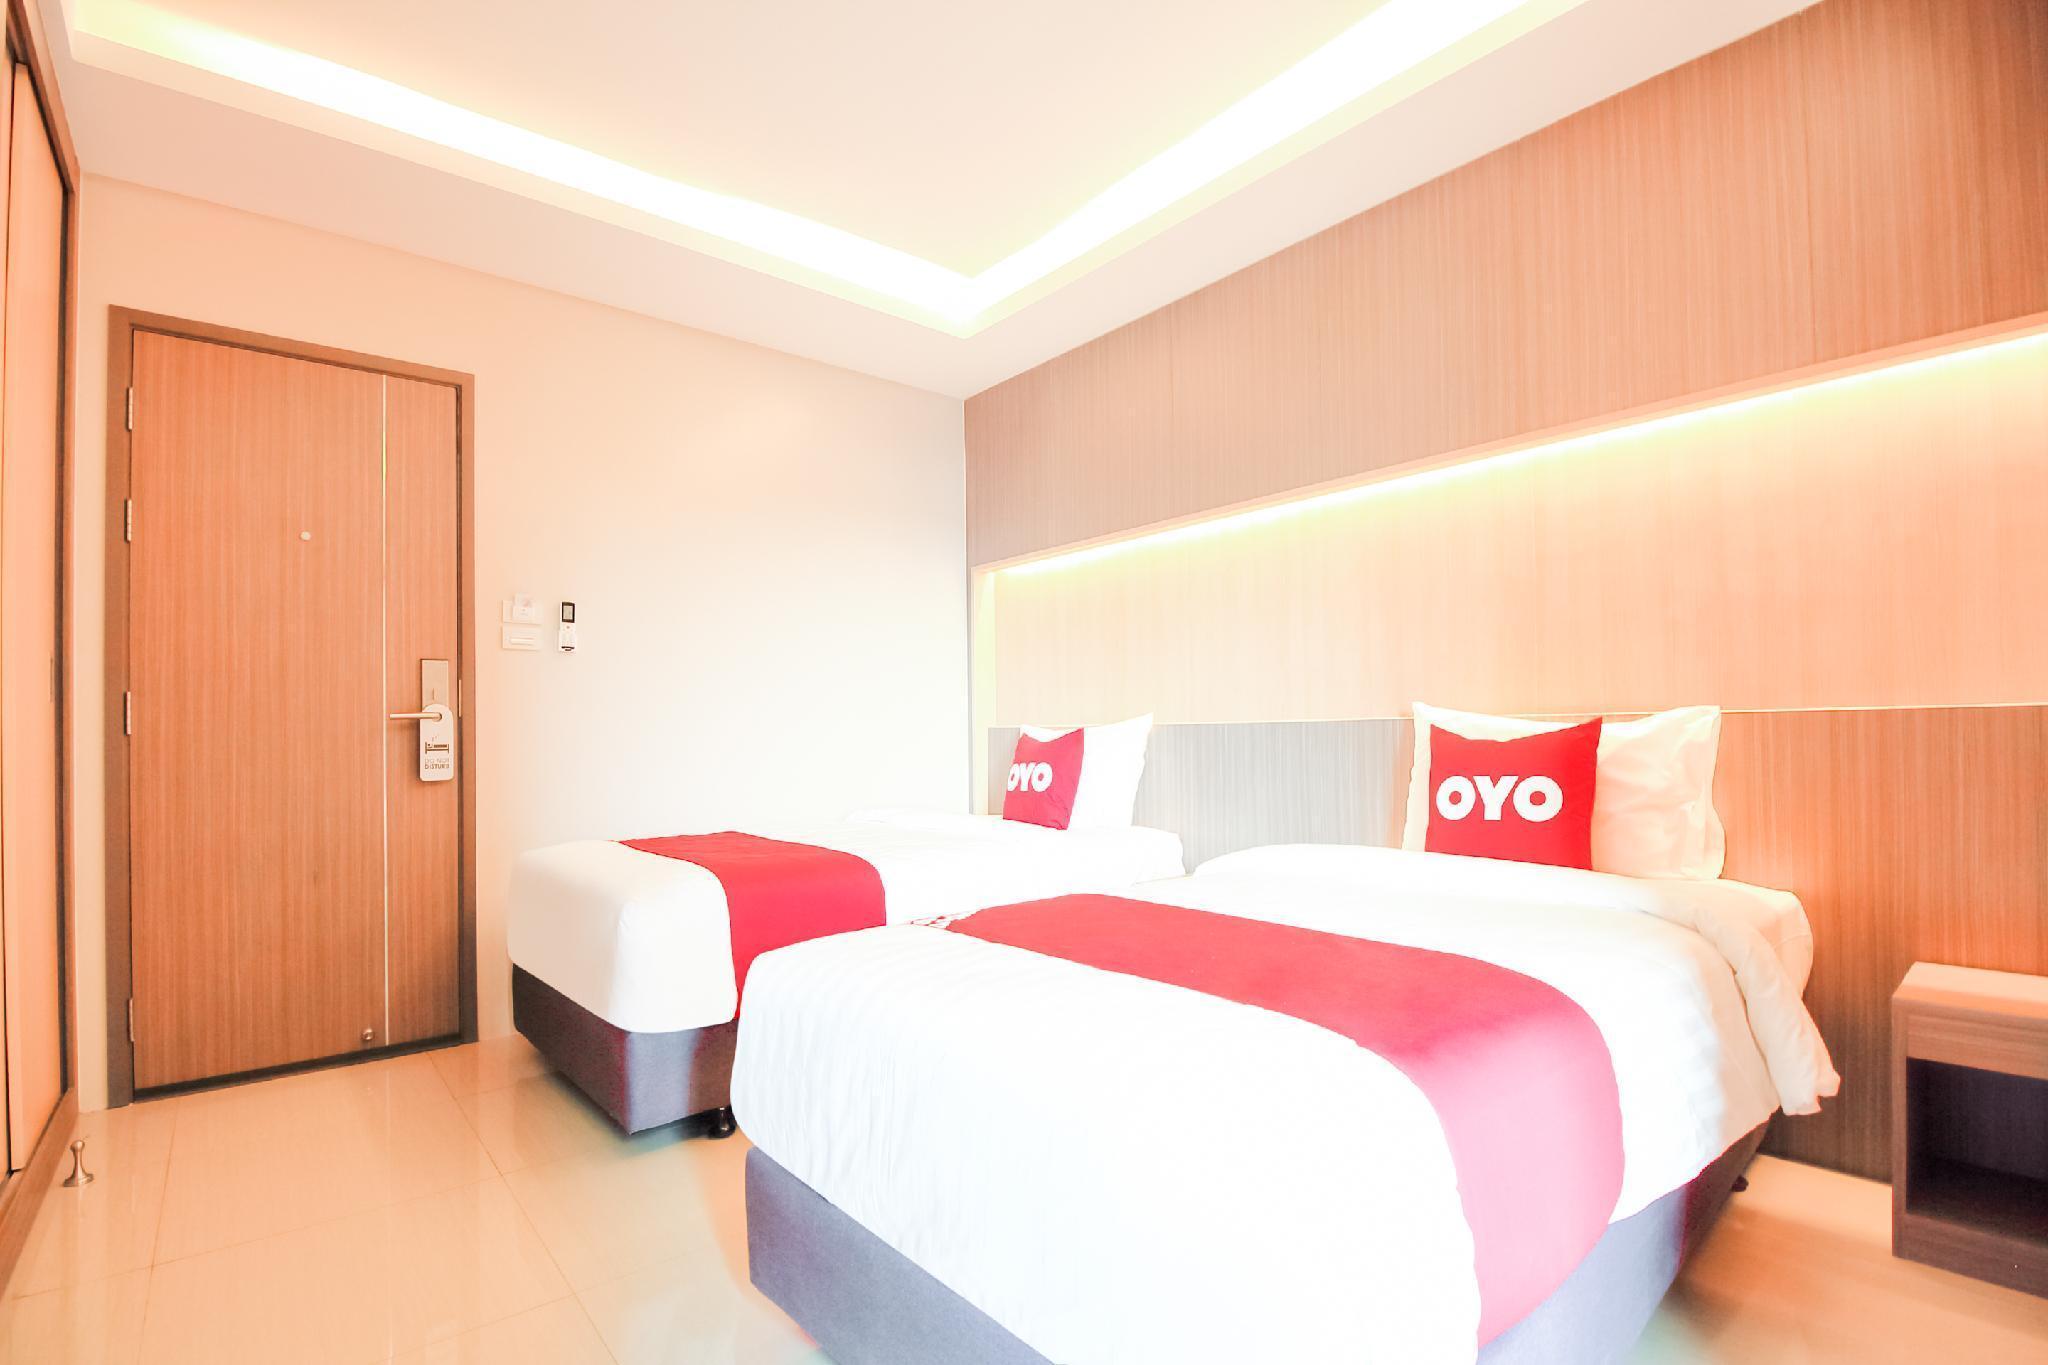 OYO 112 Sleep Hotel Bangkok โอโย 112 สลีป โฮเต็ล กรุงเทพฯ